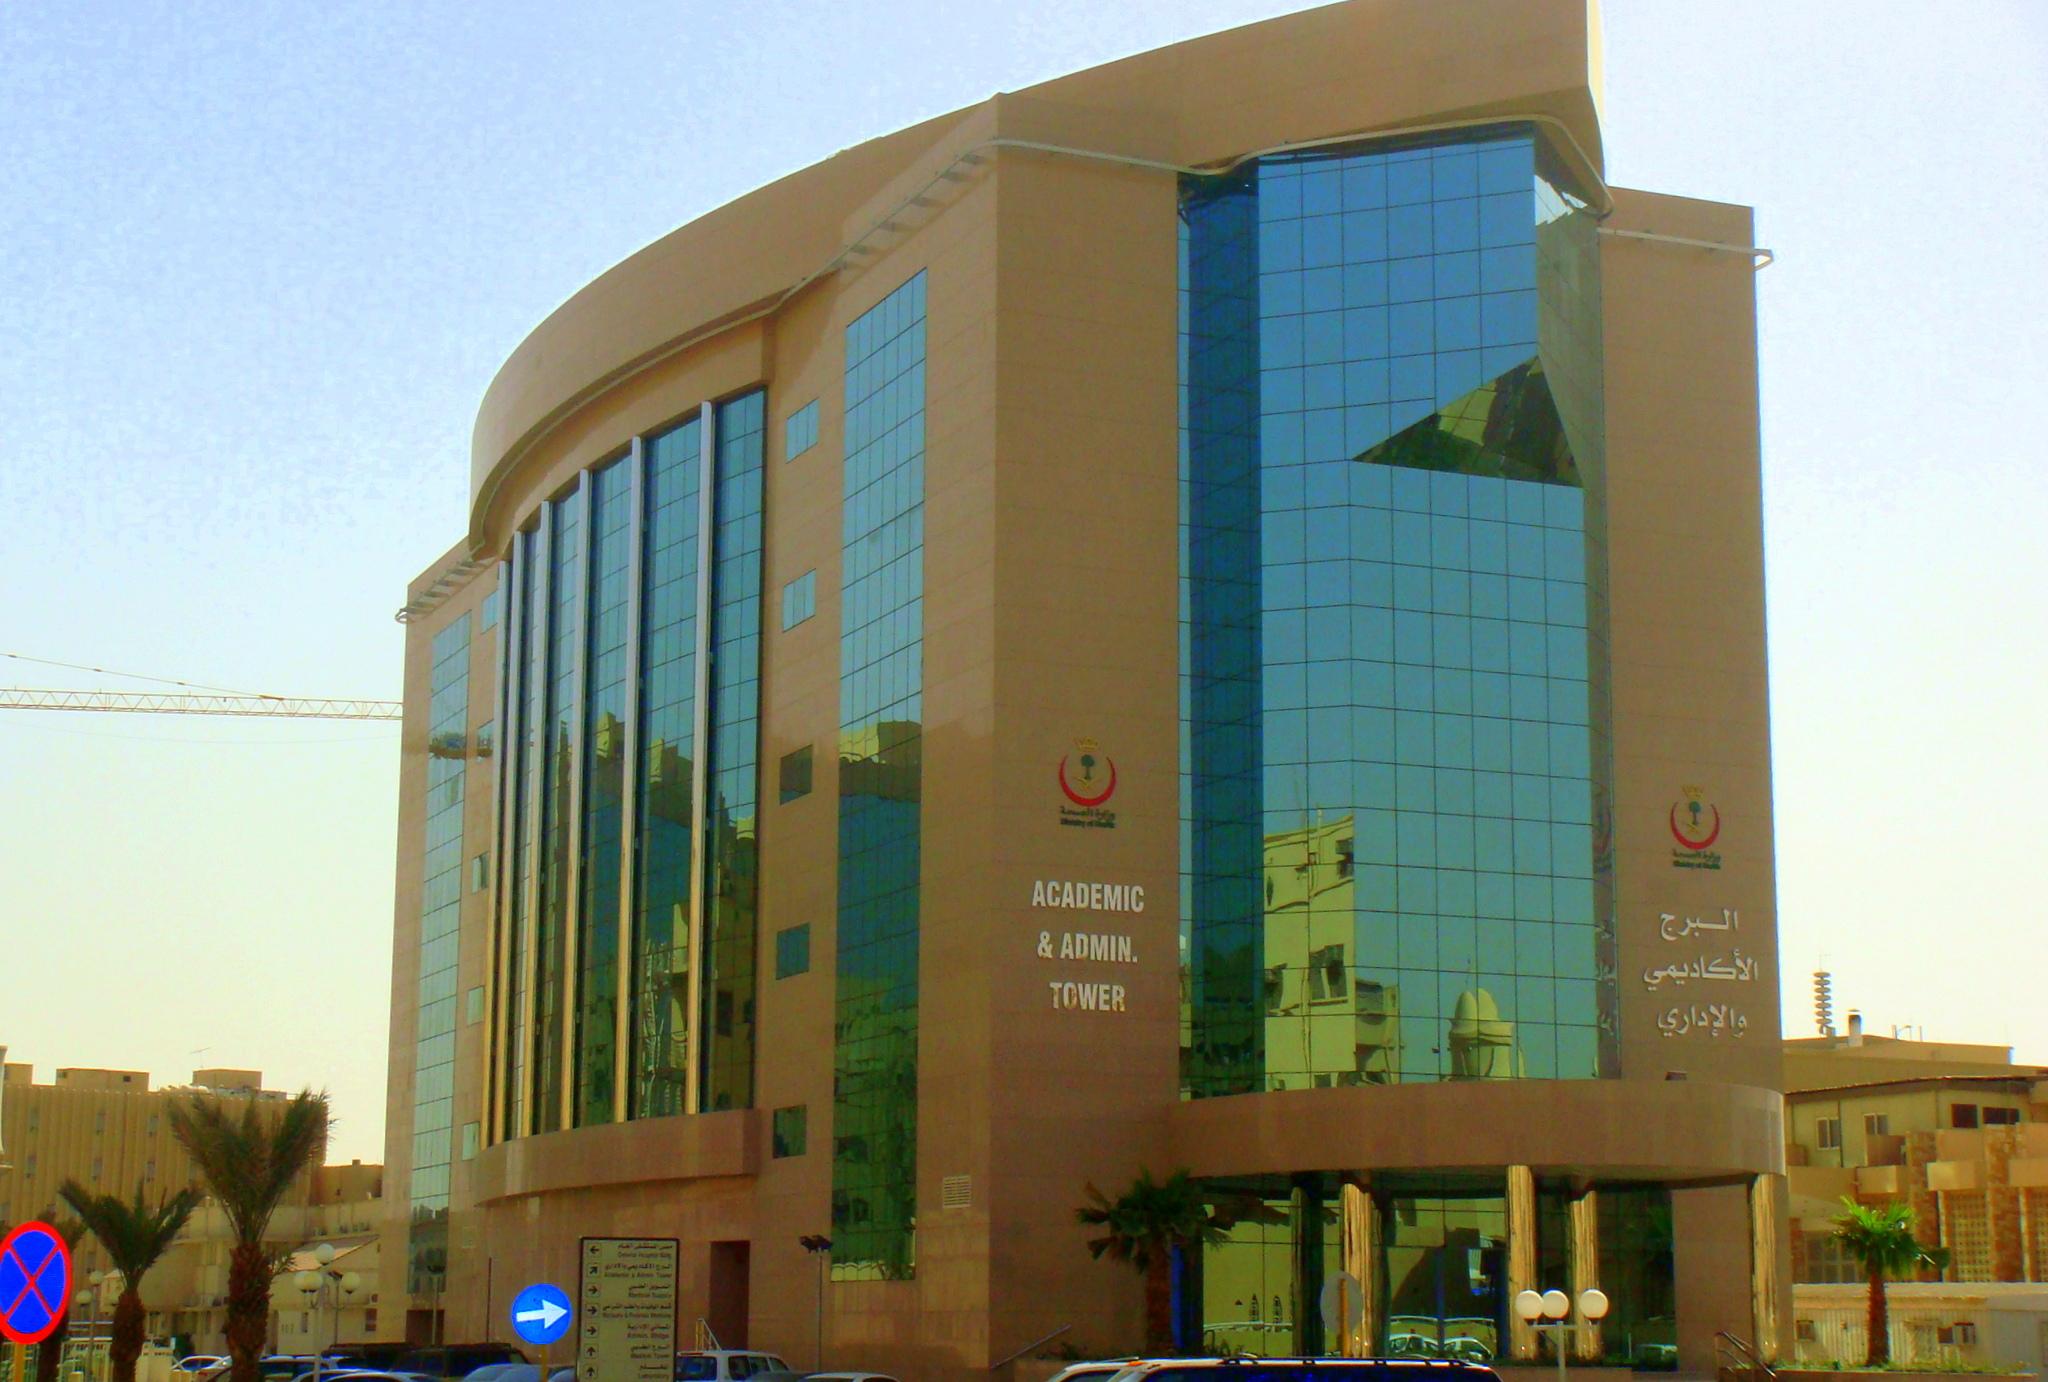 Saudi MOH hiring 400 staff nurses for King Saud Medical City